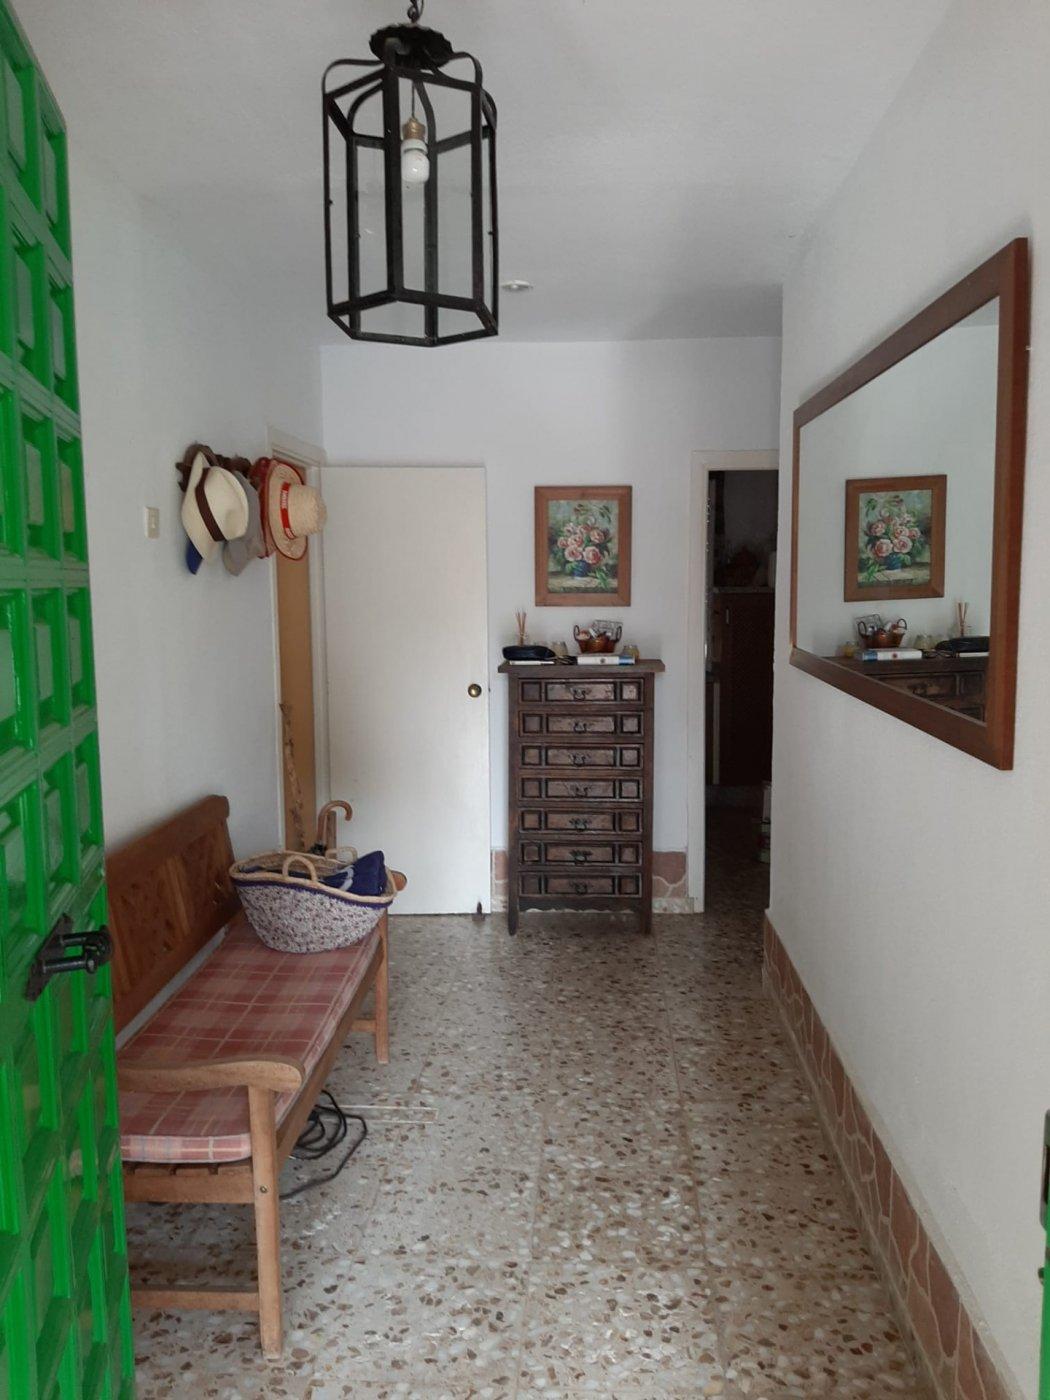 Estupenda casa con piscina propia en zona de assuan- las jaras-cÓrdoba. - imagenInmueble9